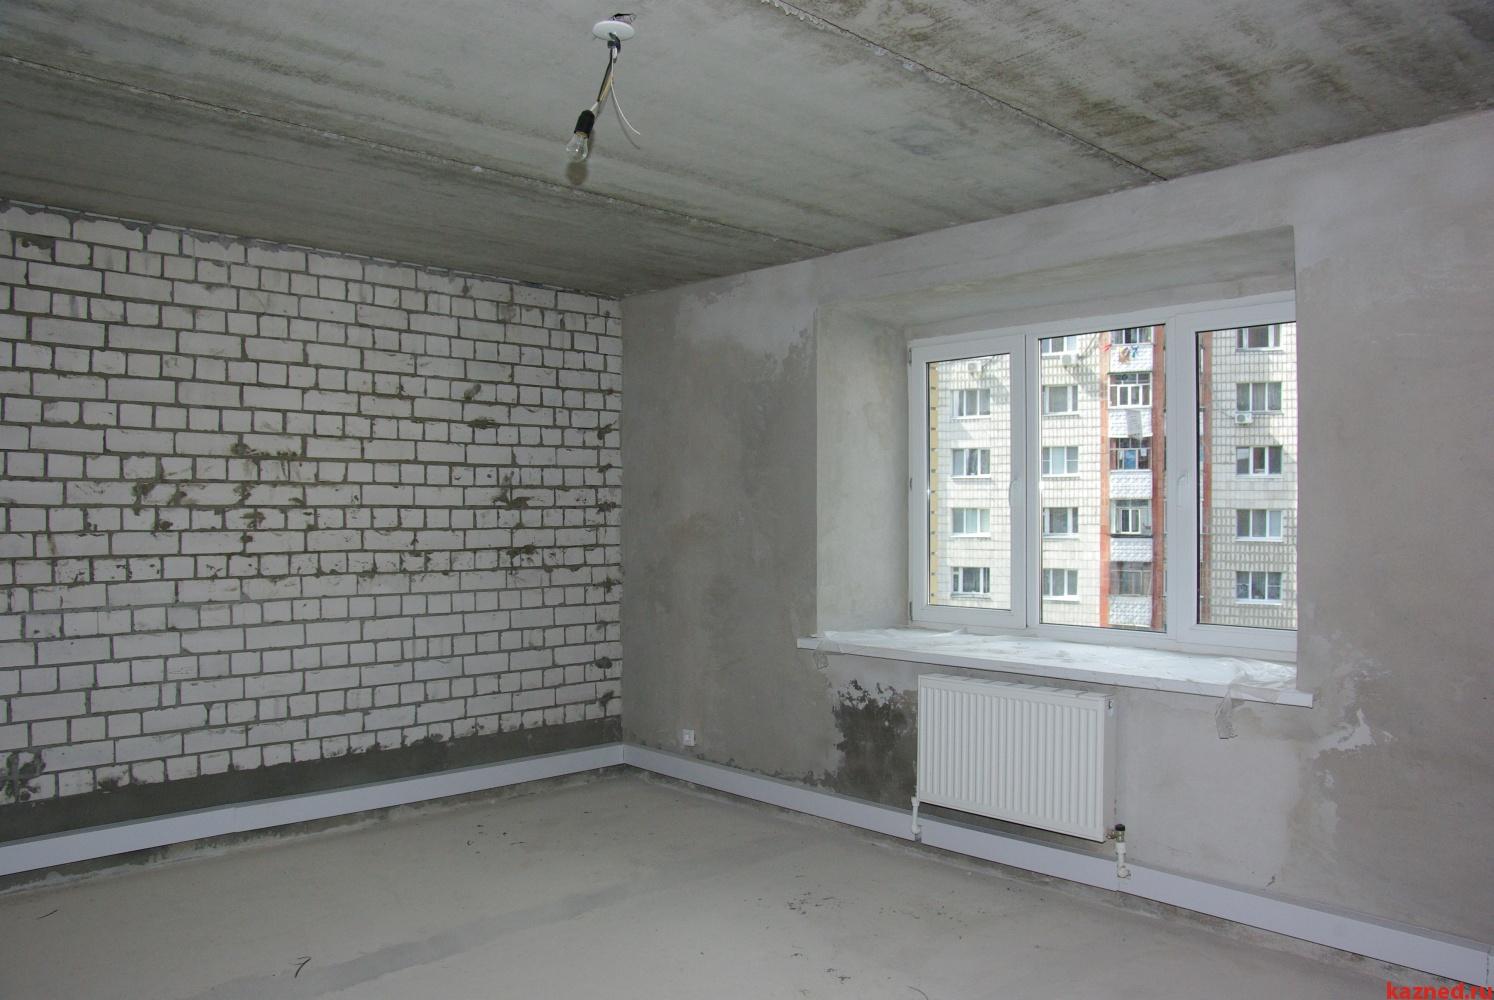 Продажа 2-к квартиры Лукина д. 52, 60 м²  (миниатюра №3)